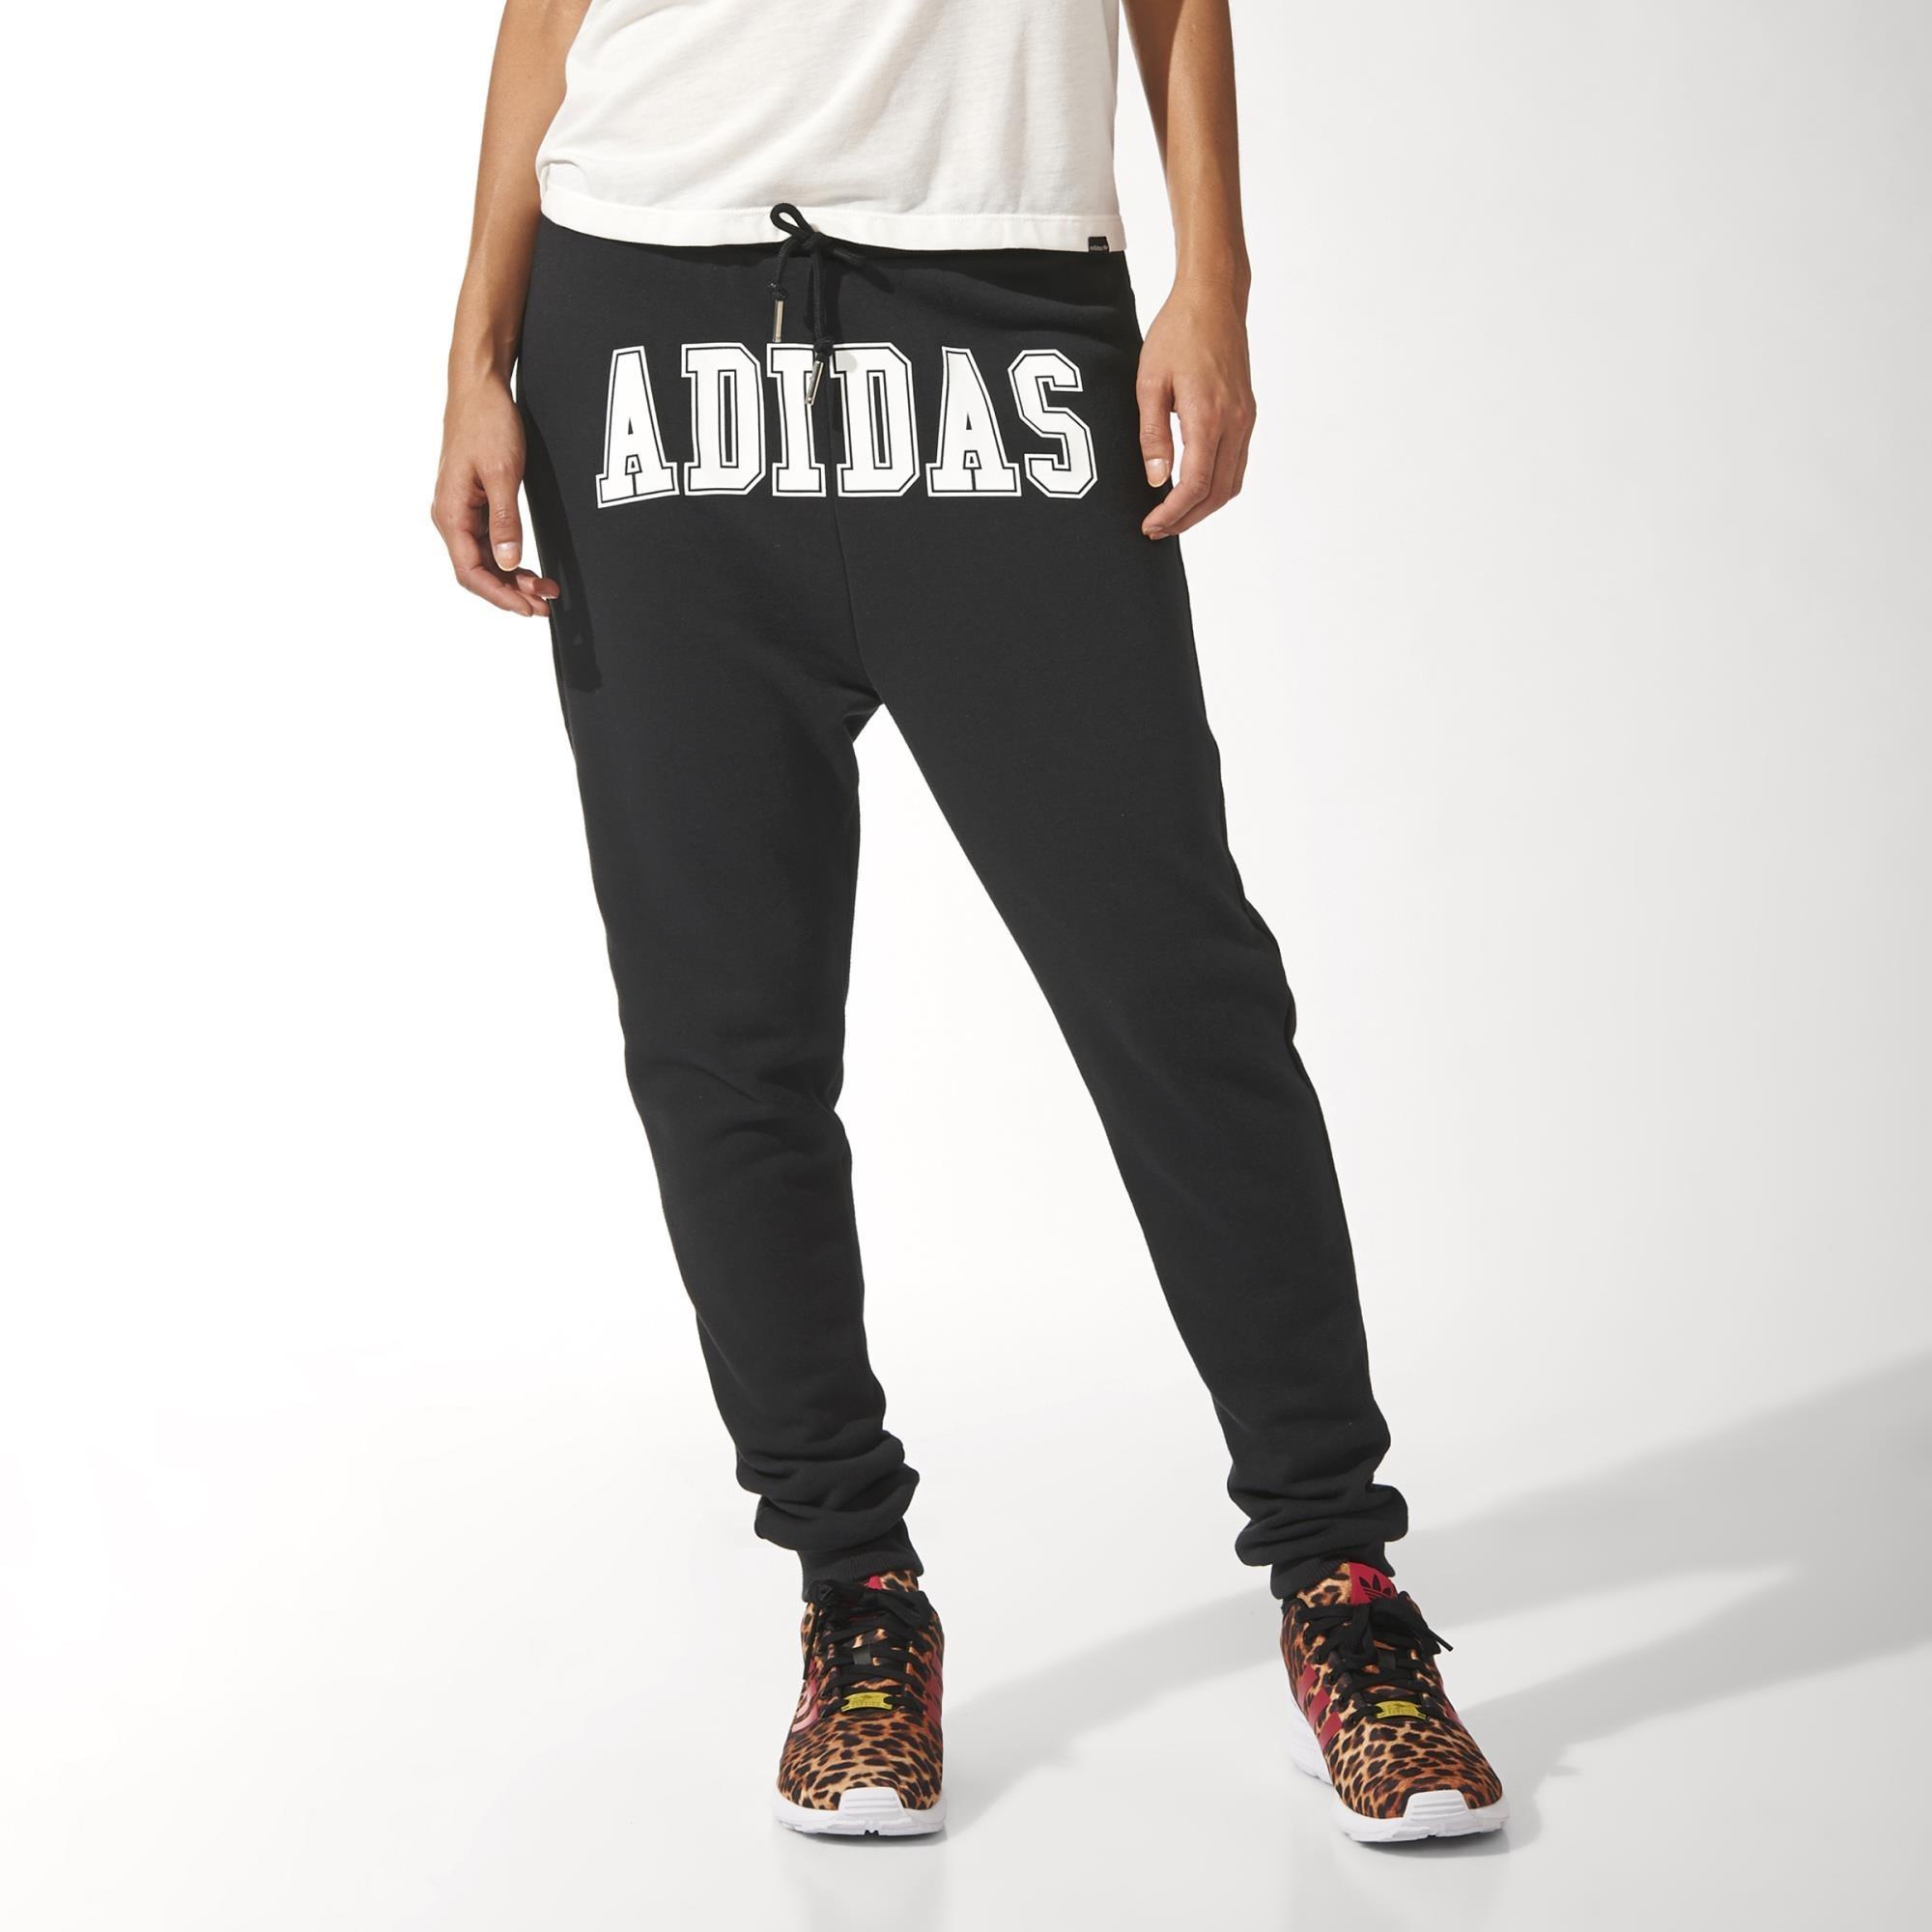 tuta adidas hip hop | Benvenuto per comprare